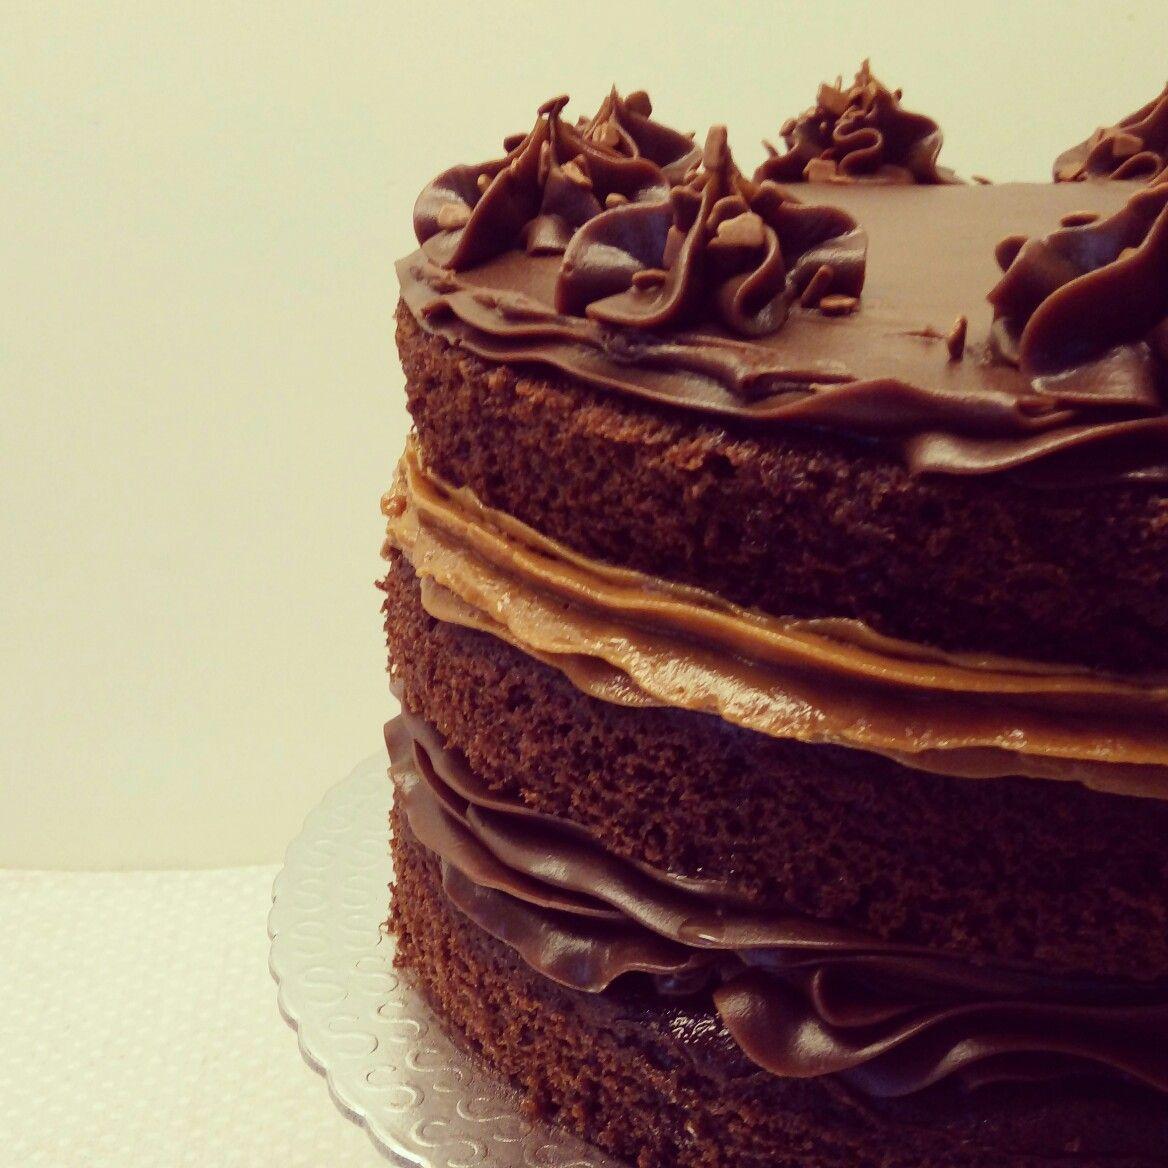 Naked cake chocolate & brigadeiro - Pecadille